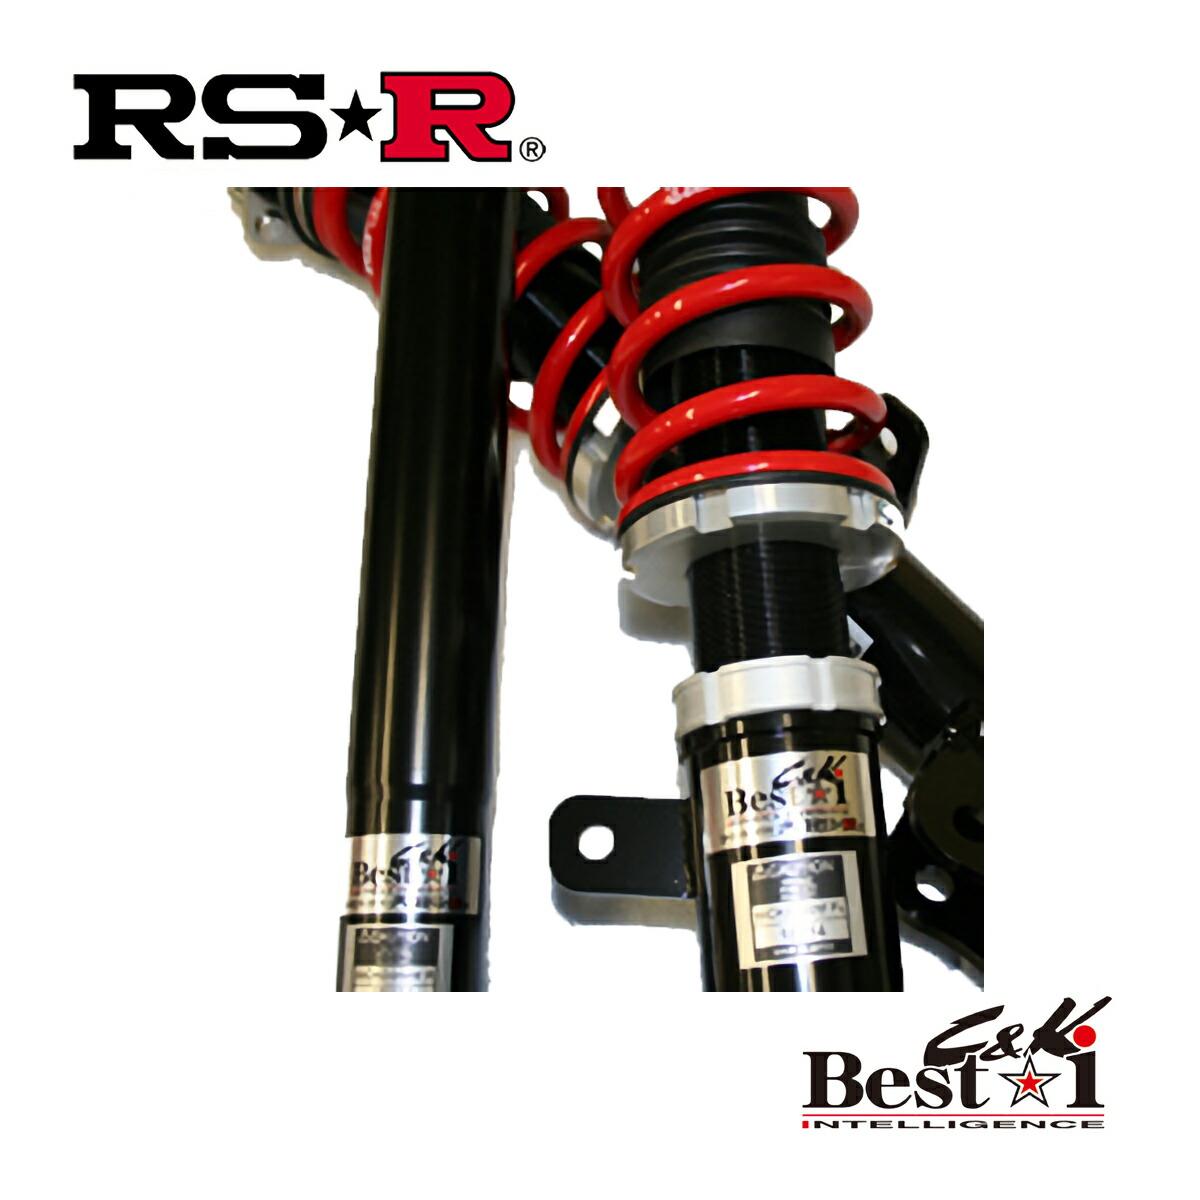 RS-R エブリィ エブリイ エブリー ワゴン DA17W PZターボ(ハイルーフ) 車高調 リア車高調整: ネジ式 BICKS650H2 ベストi C&K RSR 個人宅発送追金有